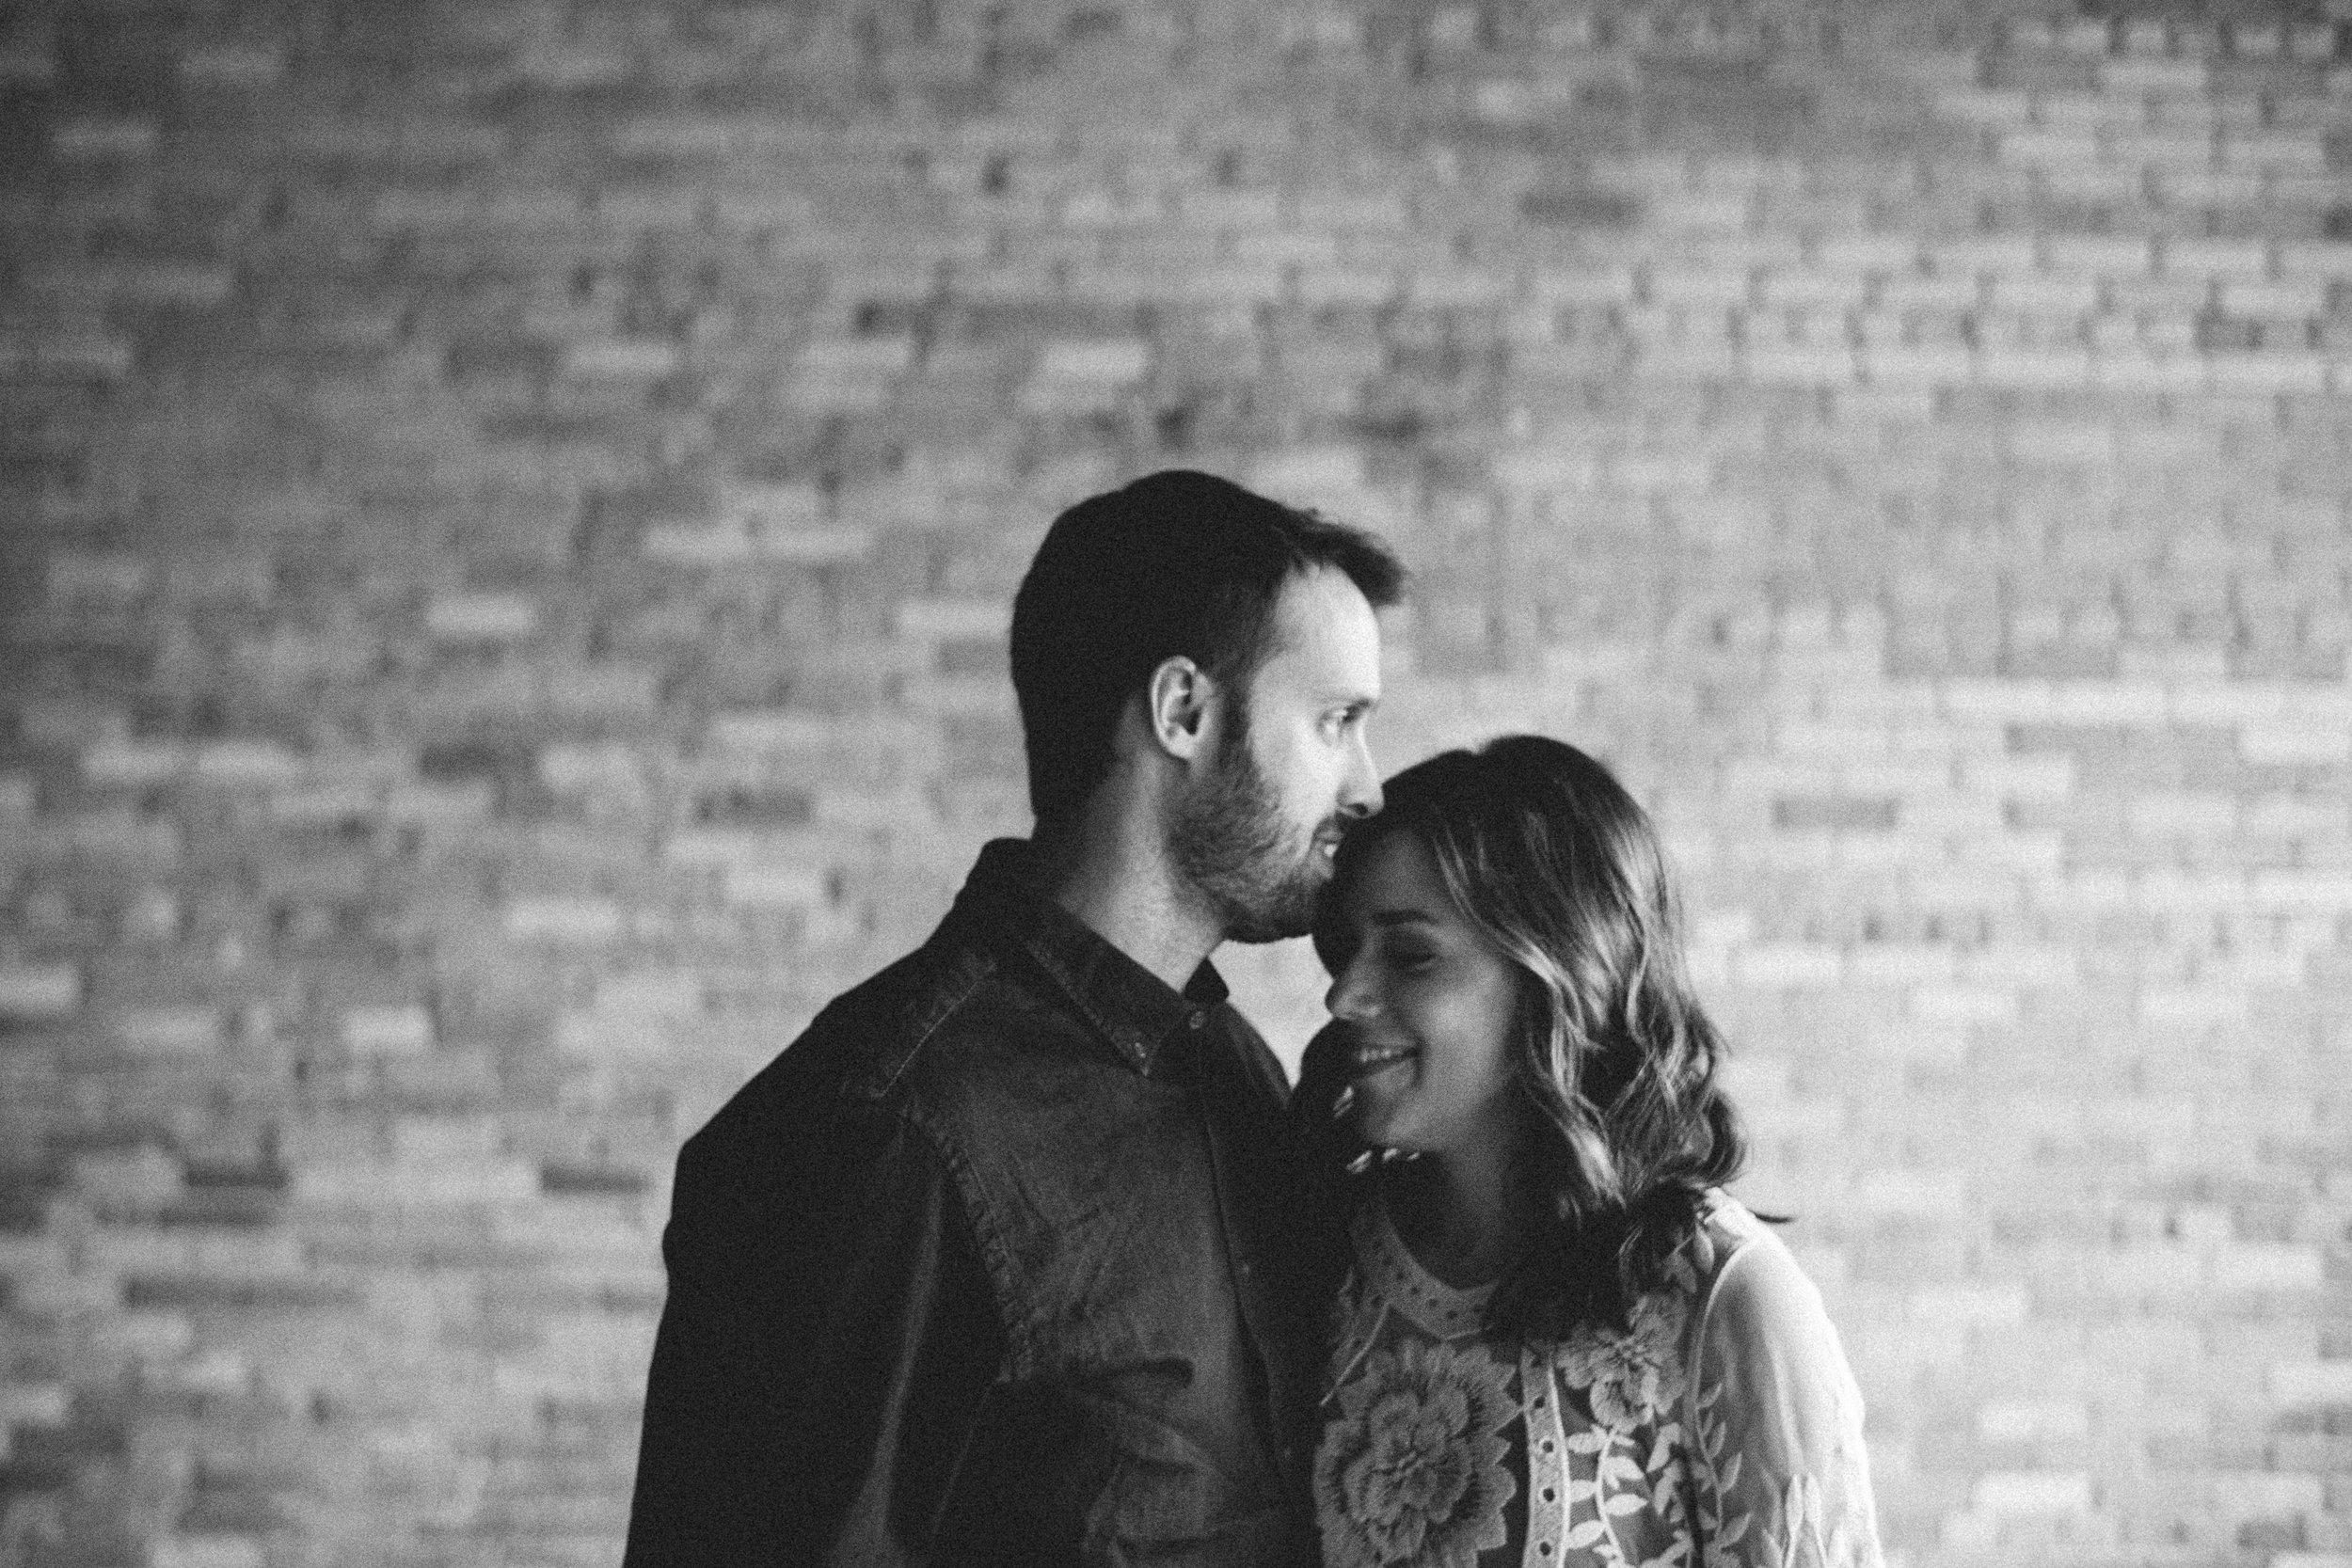 Lauren_Nick_Manzer_Bailey_Engagement_Photos_0079.jpg